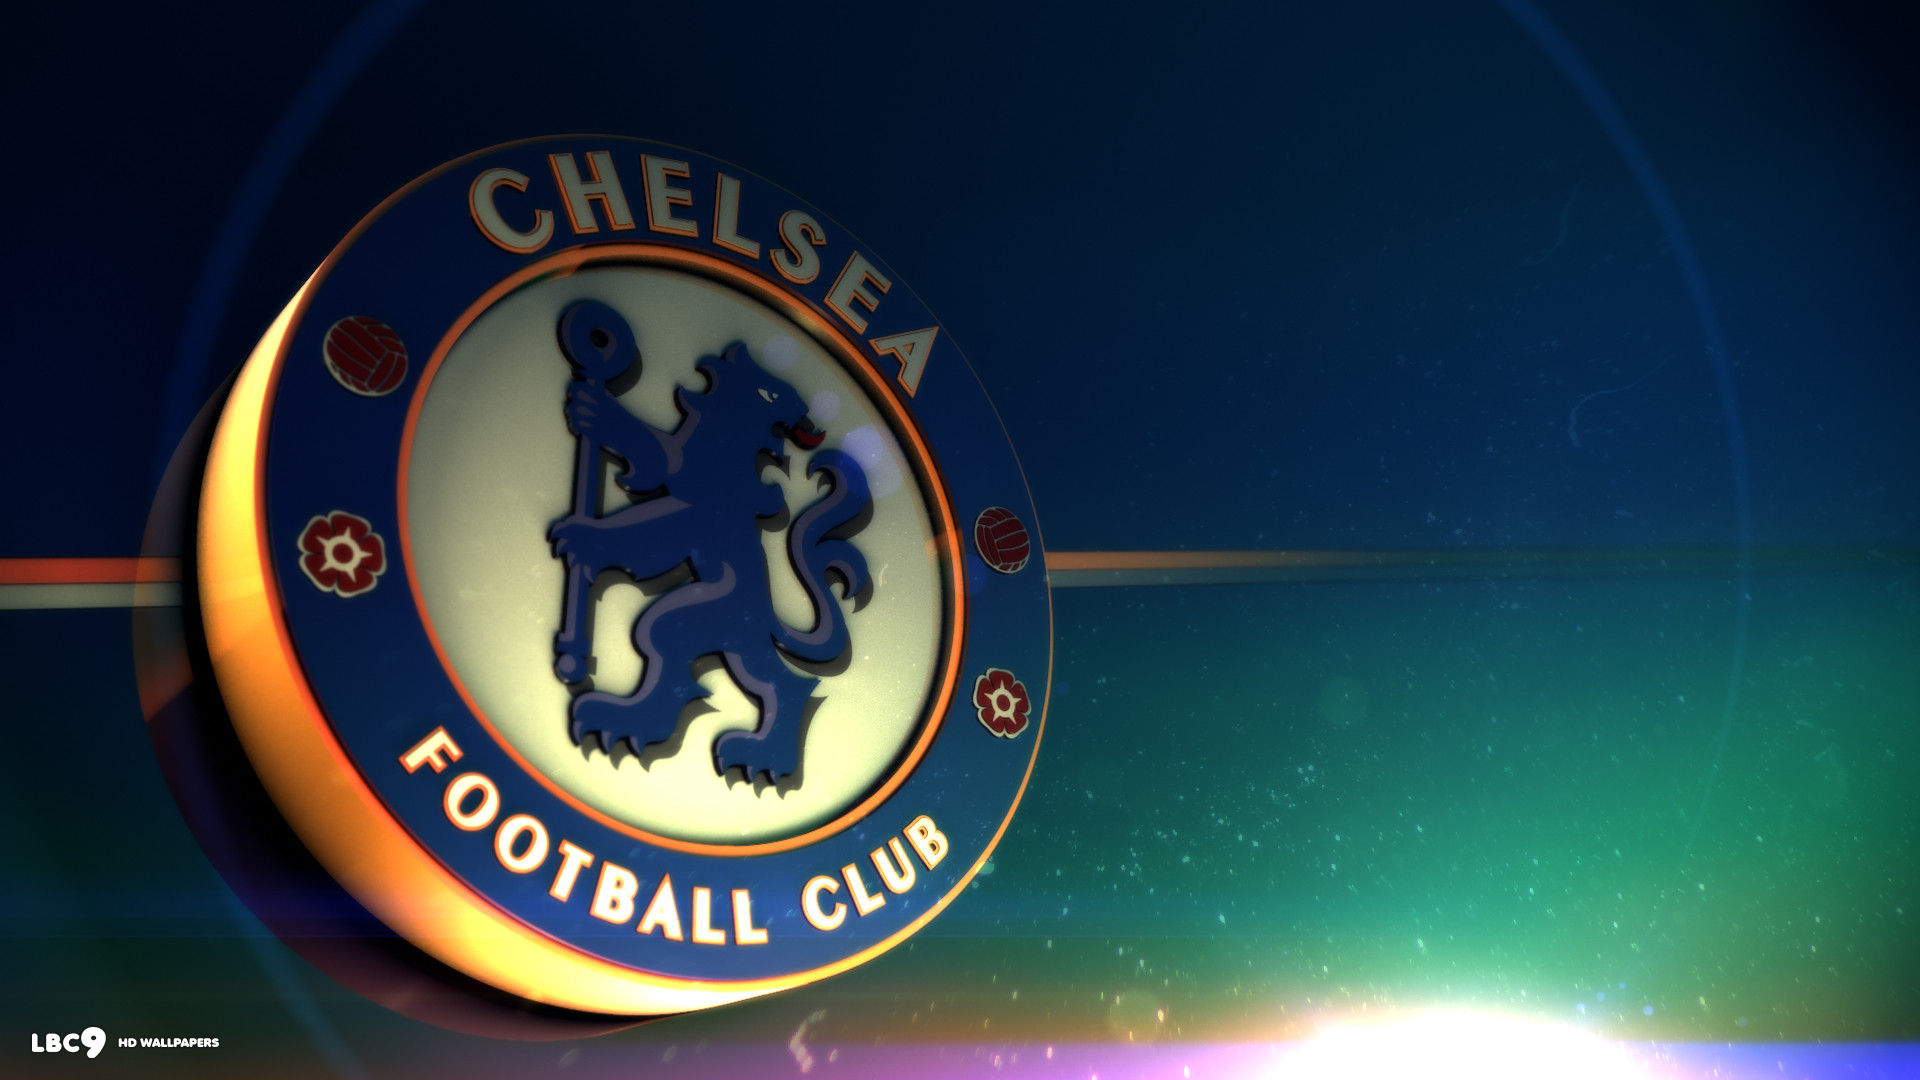 Football Clubs: Chelsea Football Club Wallpapers